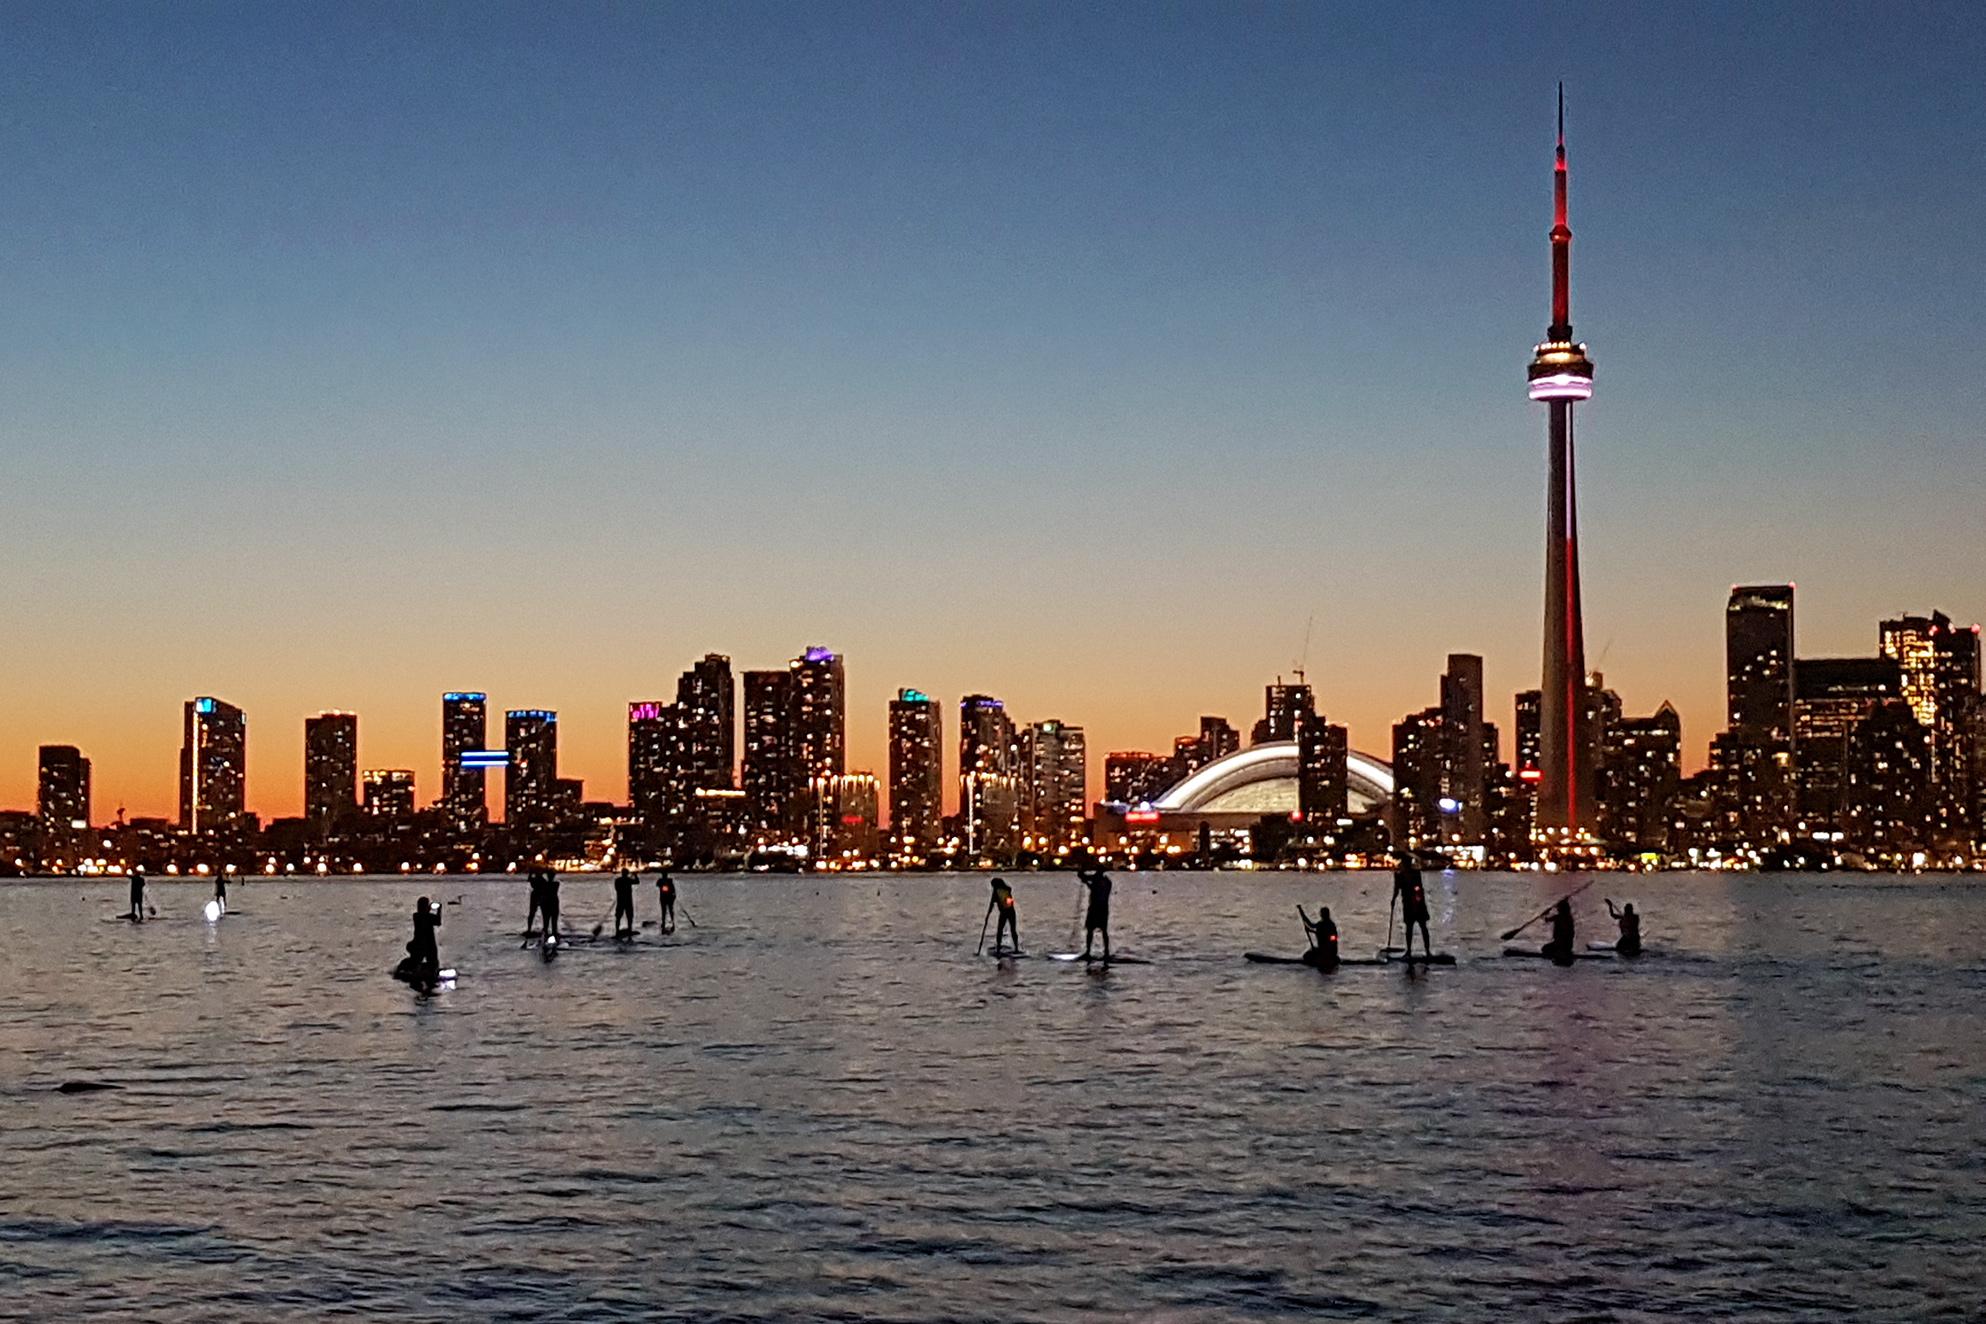 aa-Toronto-Island-Night-Paddleboarding